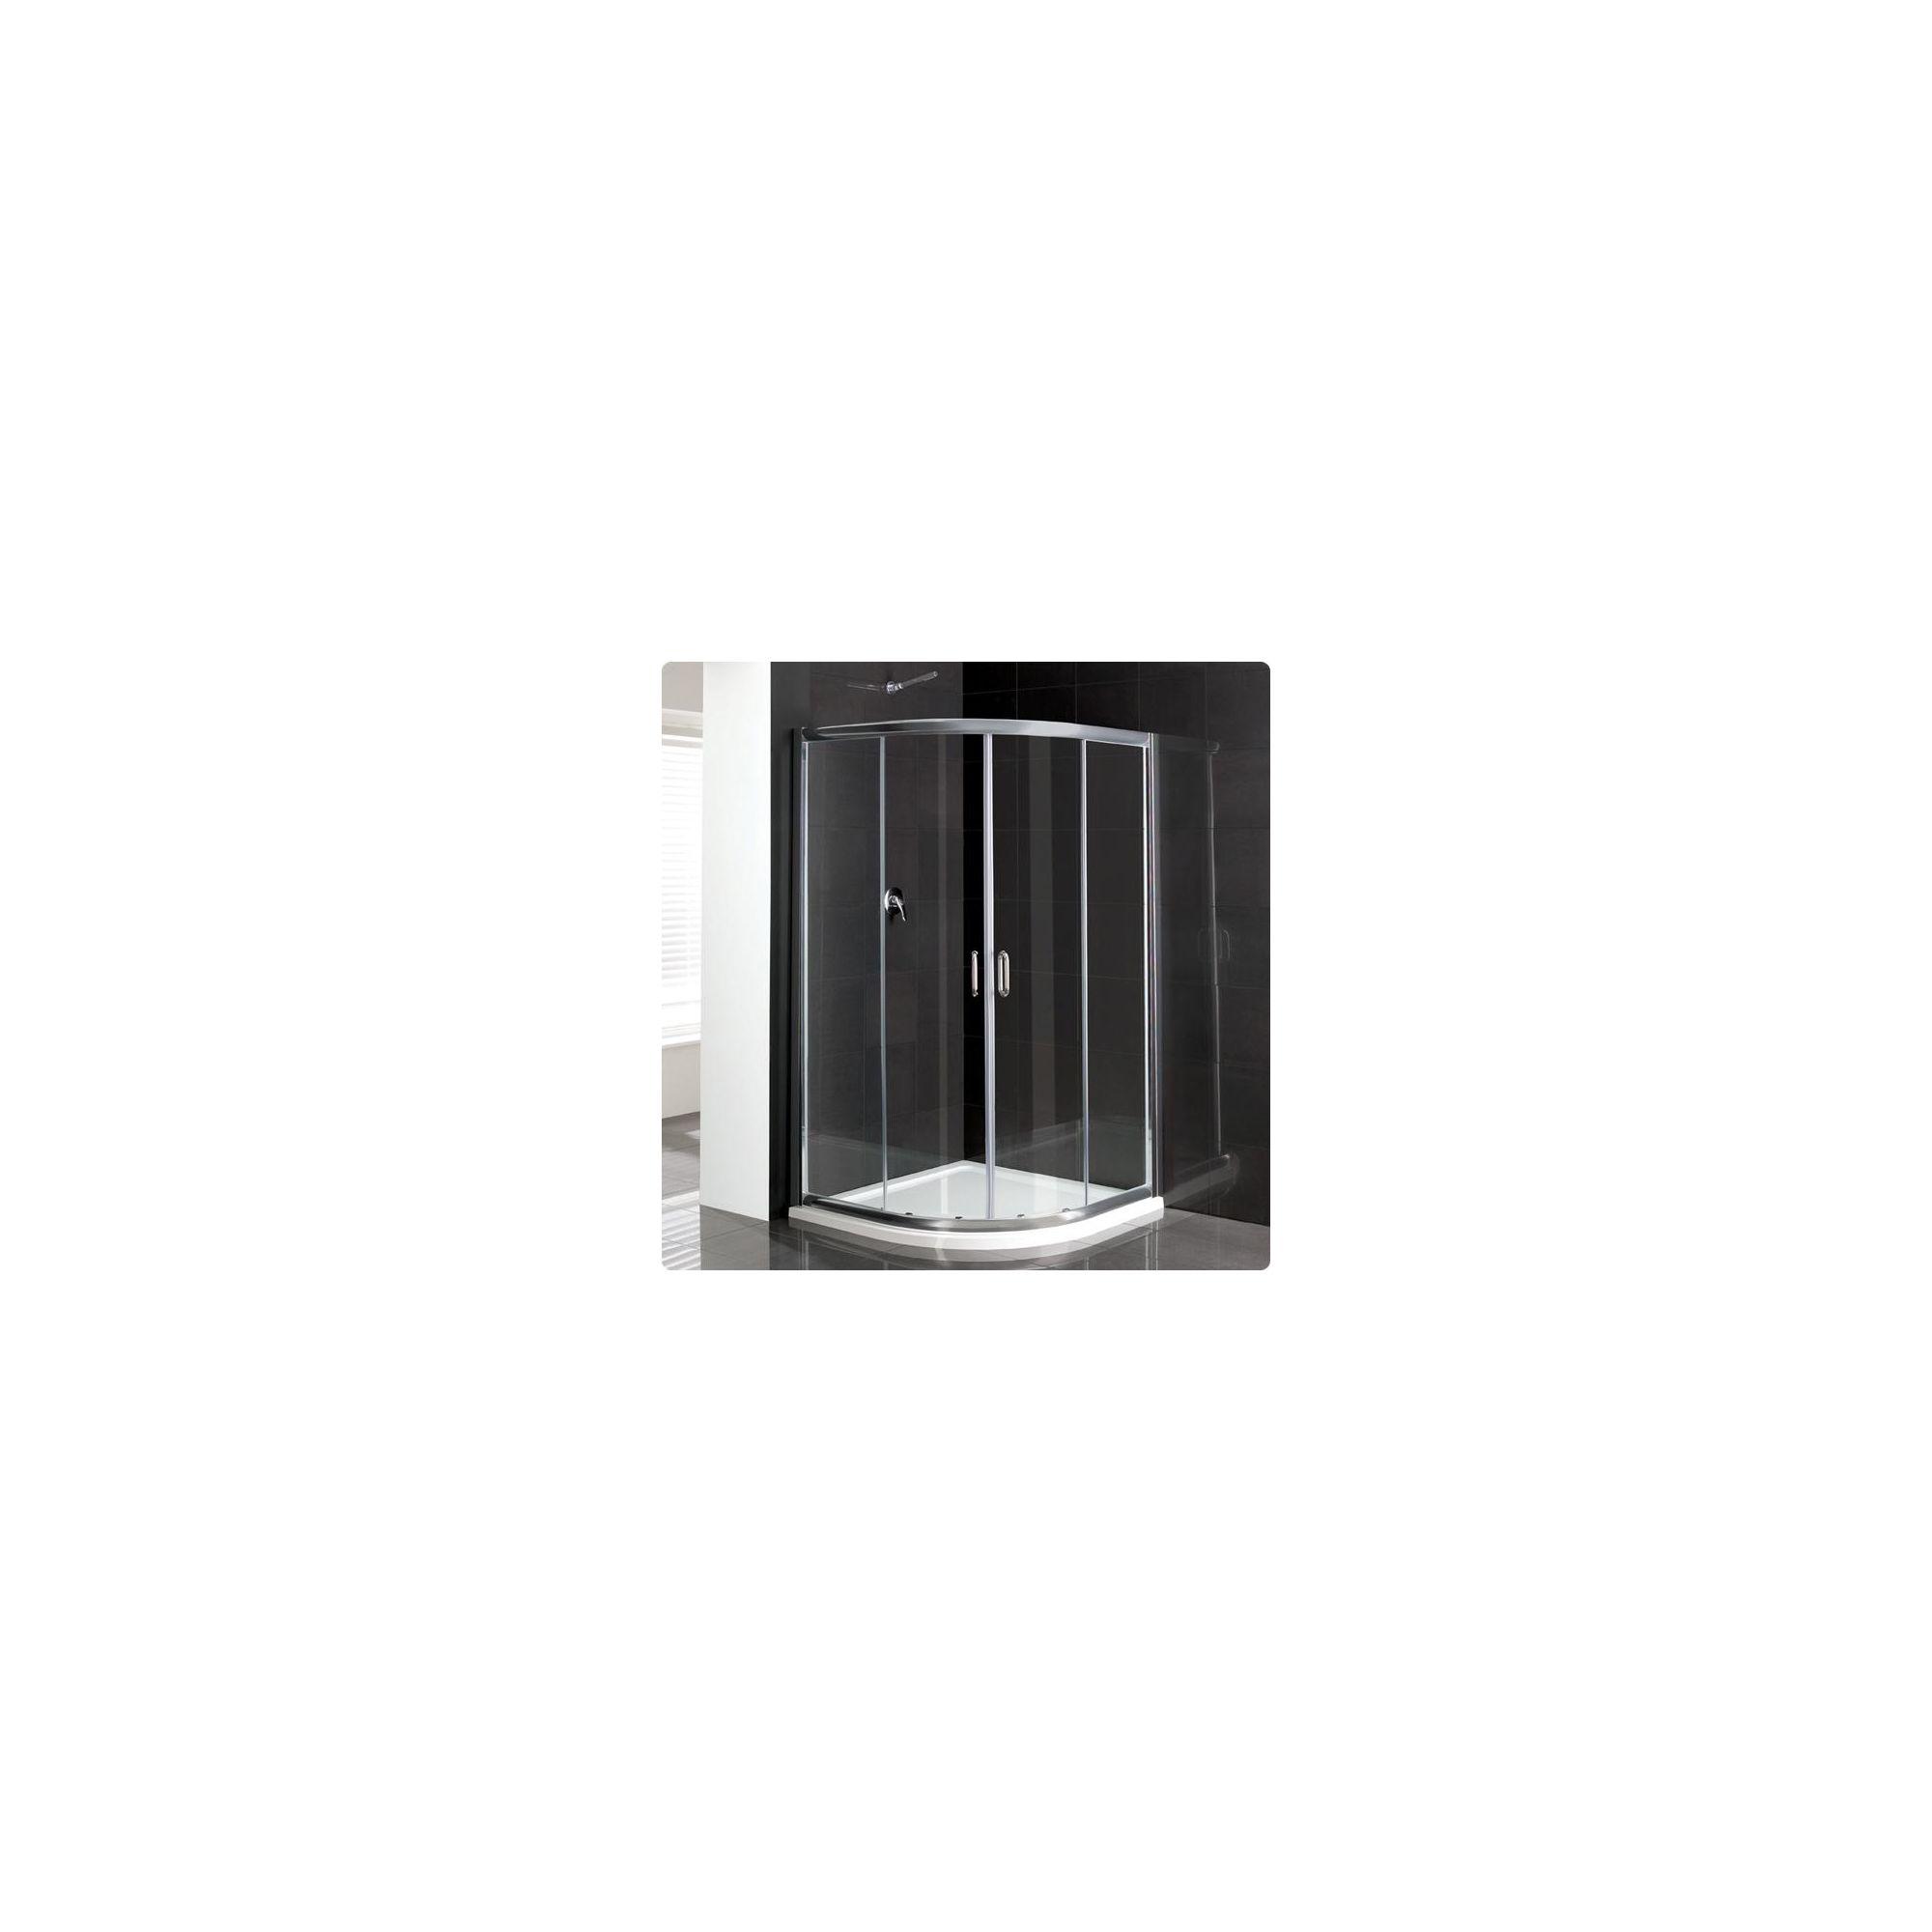 Duchy Elite Silver Quadrant Shower Enclosure 900mm, Standard Tray, 6mm Glass at Tesco Direct